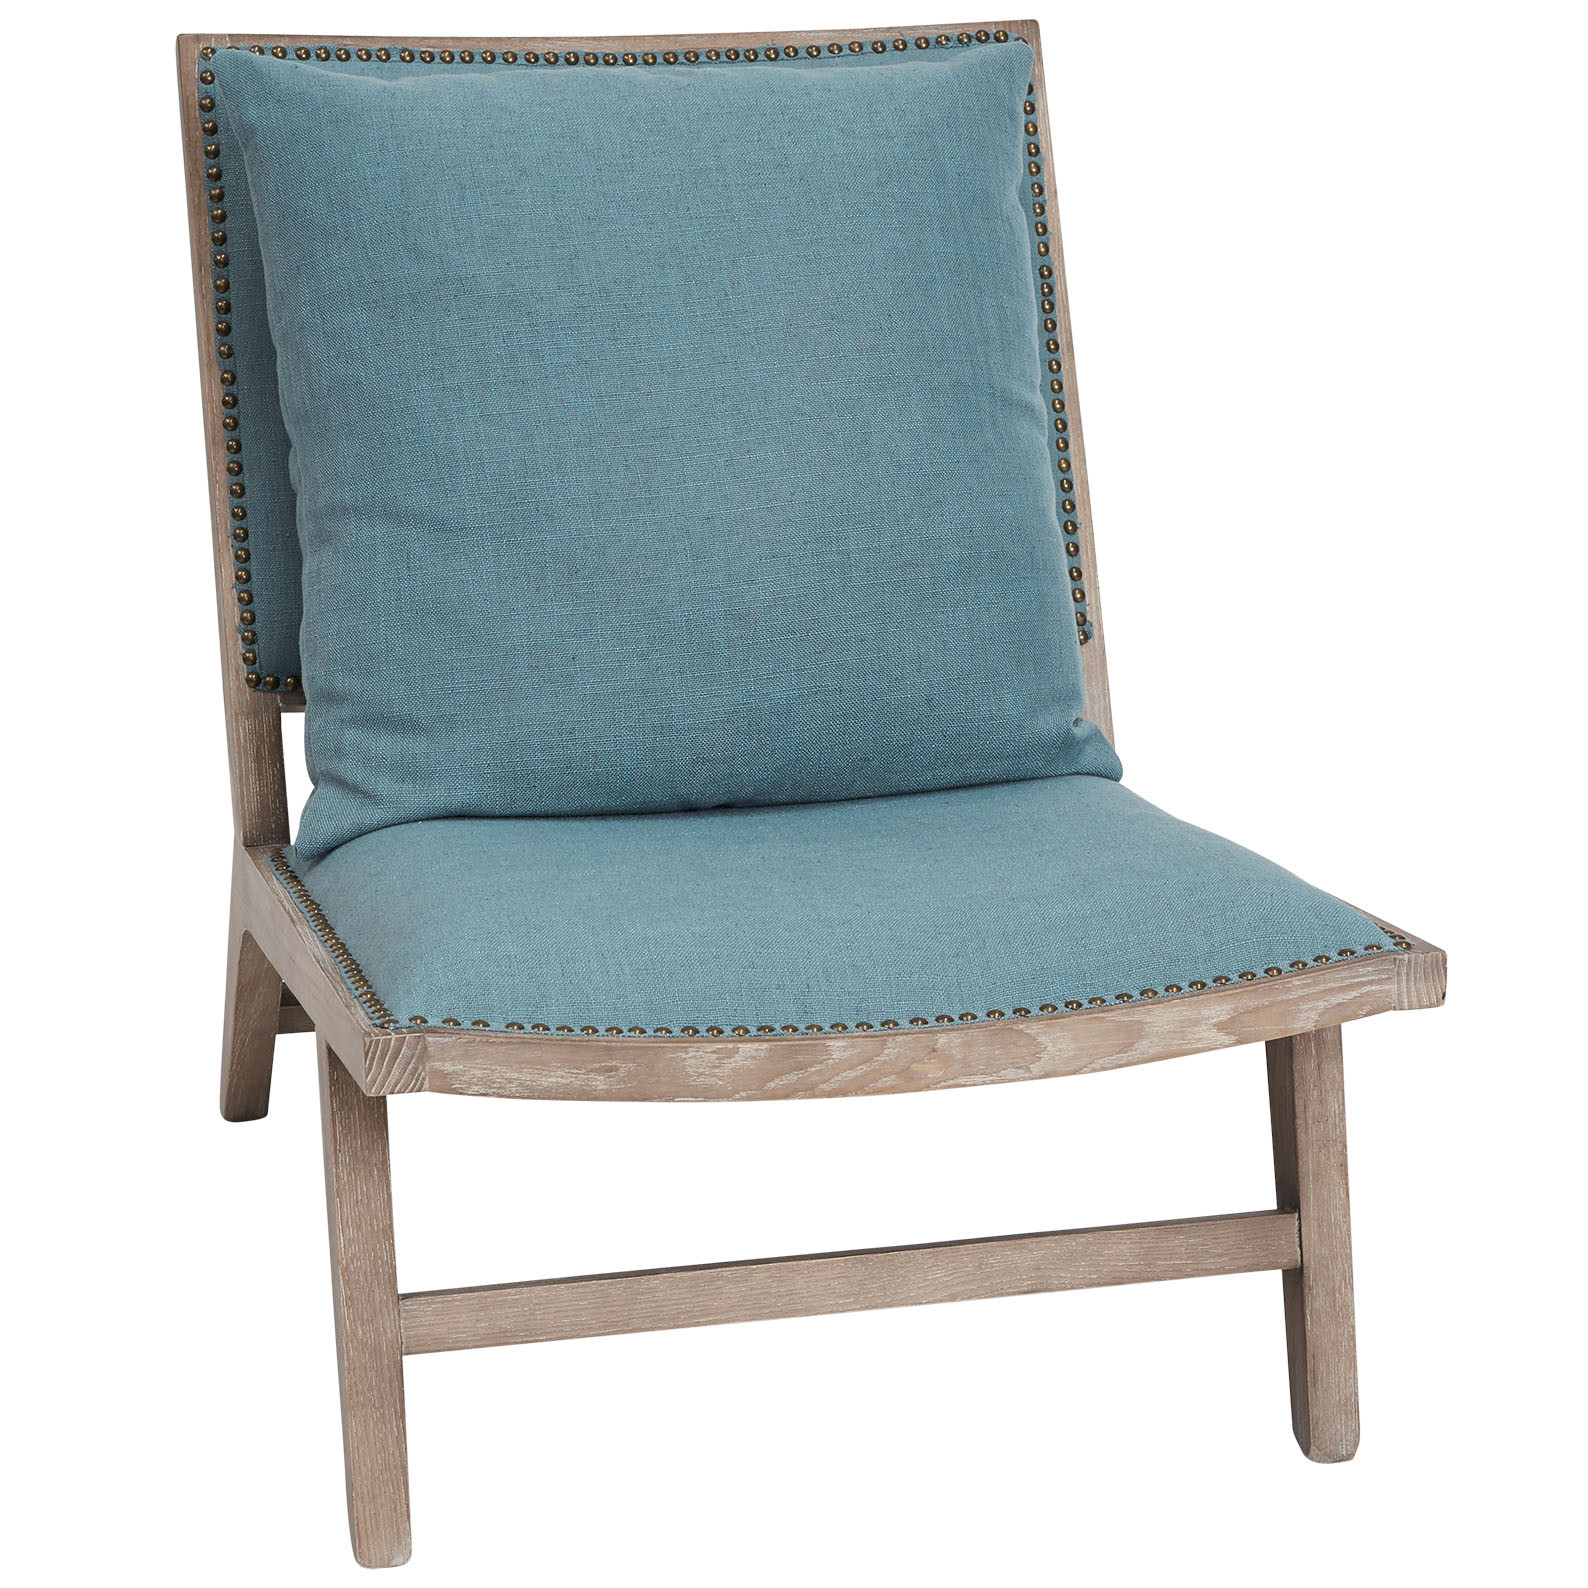 Sloane Lakesfield Chair